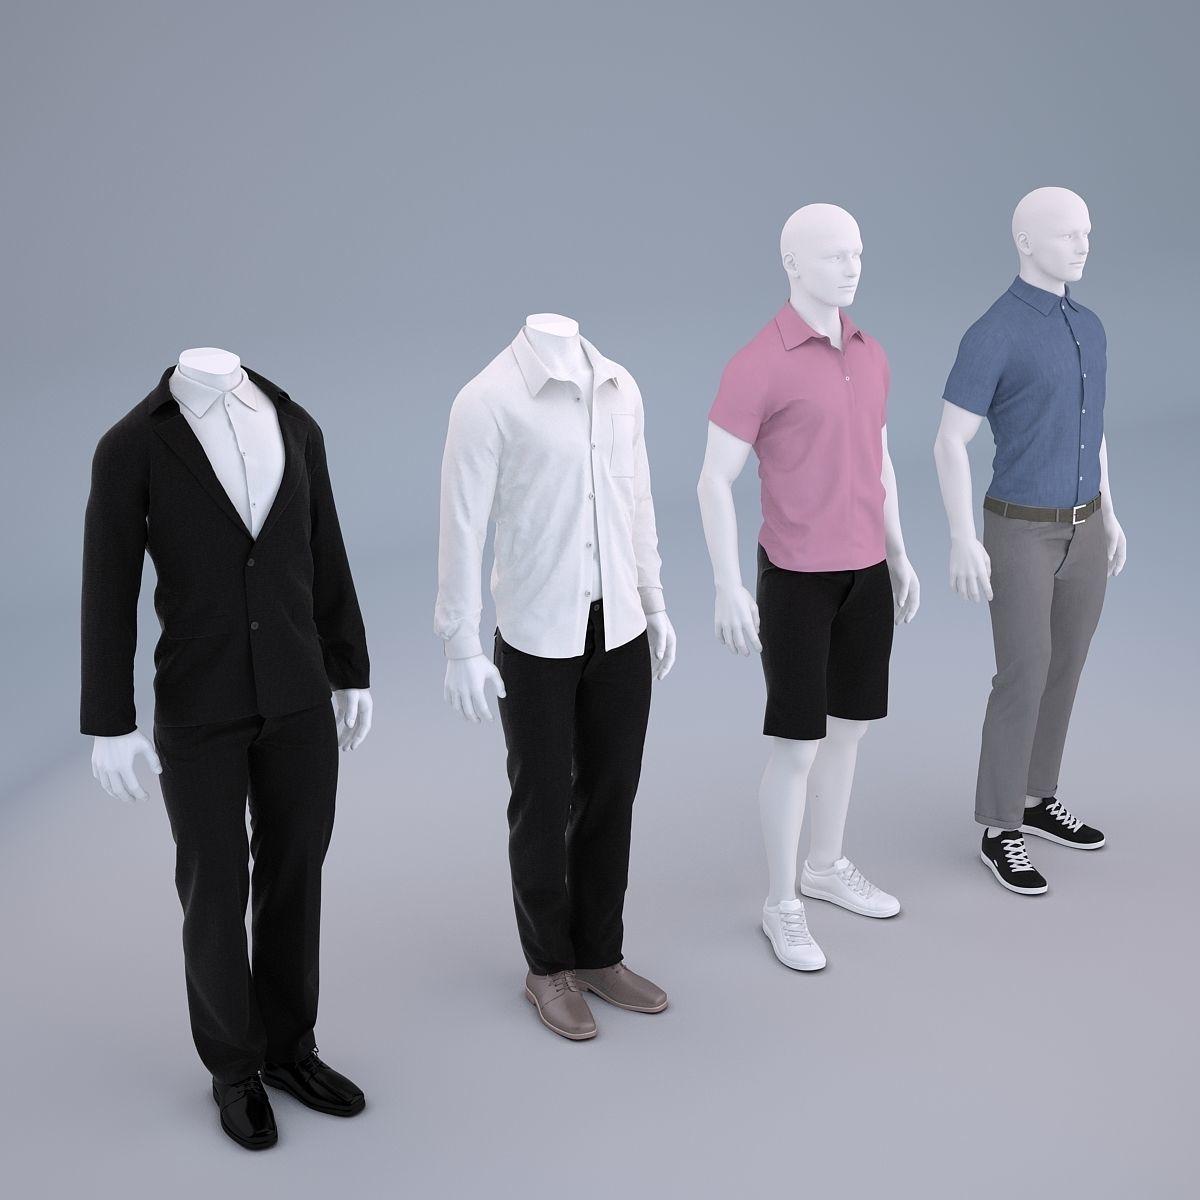 Mannequin Men Cloth Model For Shop Vol 1